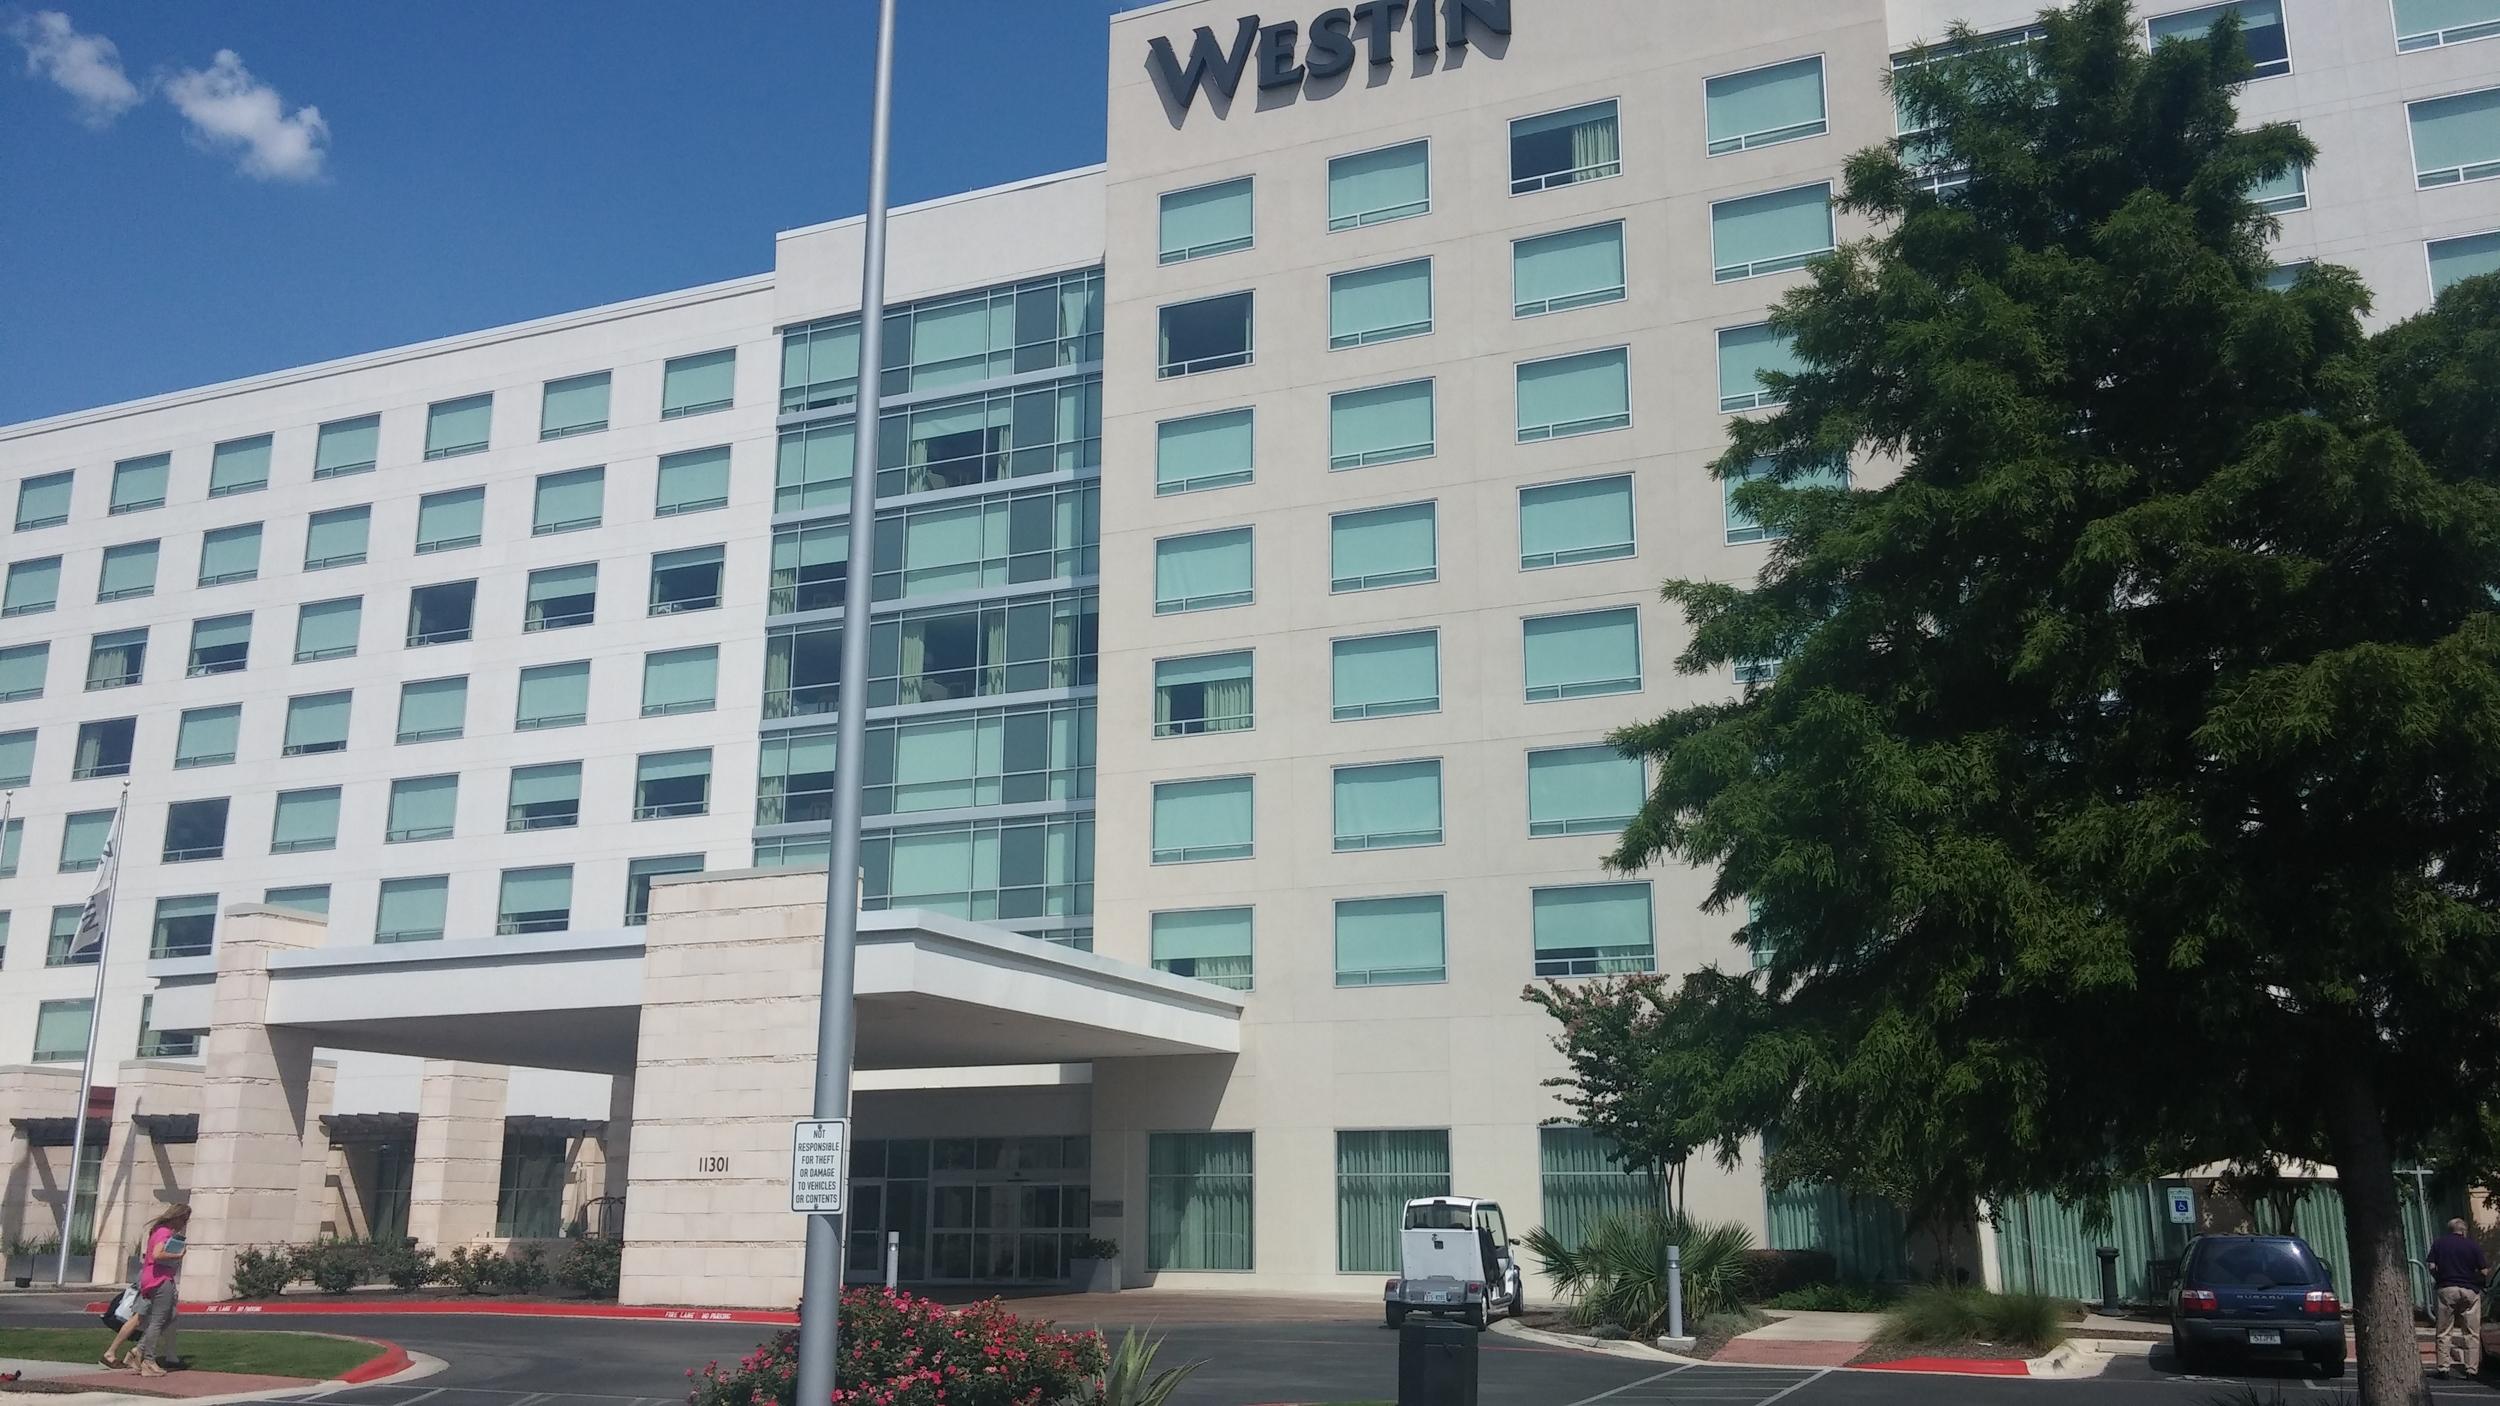 2014-08-11 Austin TX with Greg Scott at Westin (5).jpg